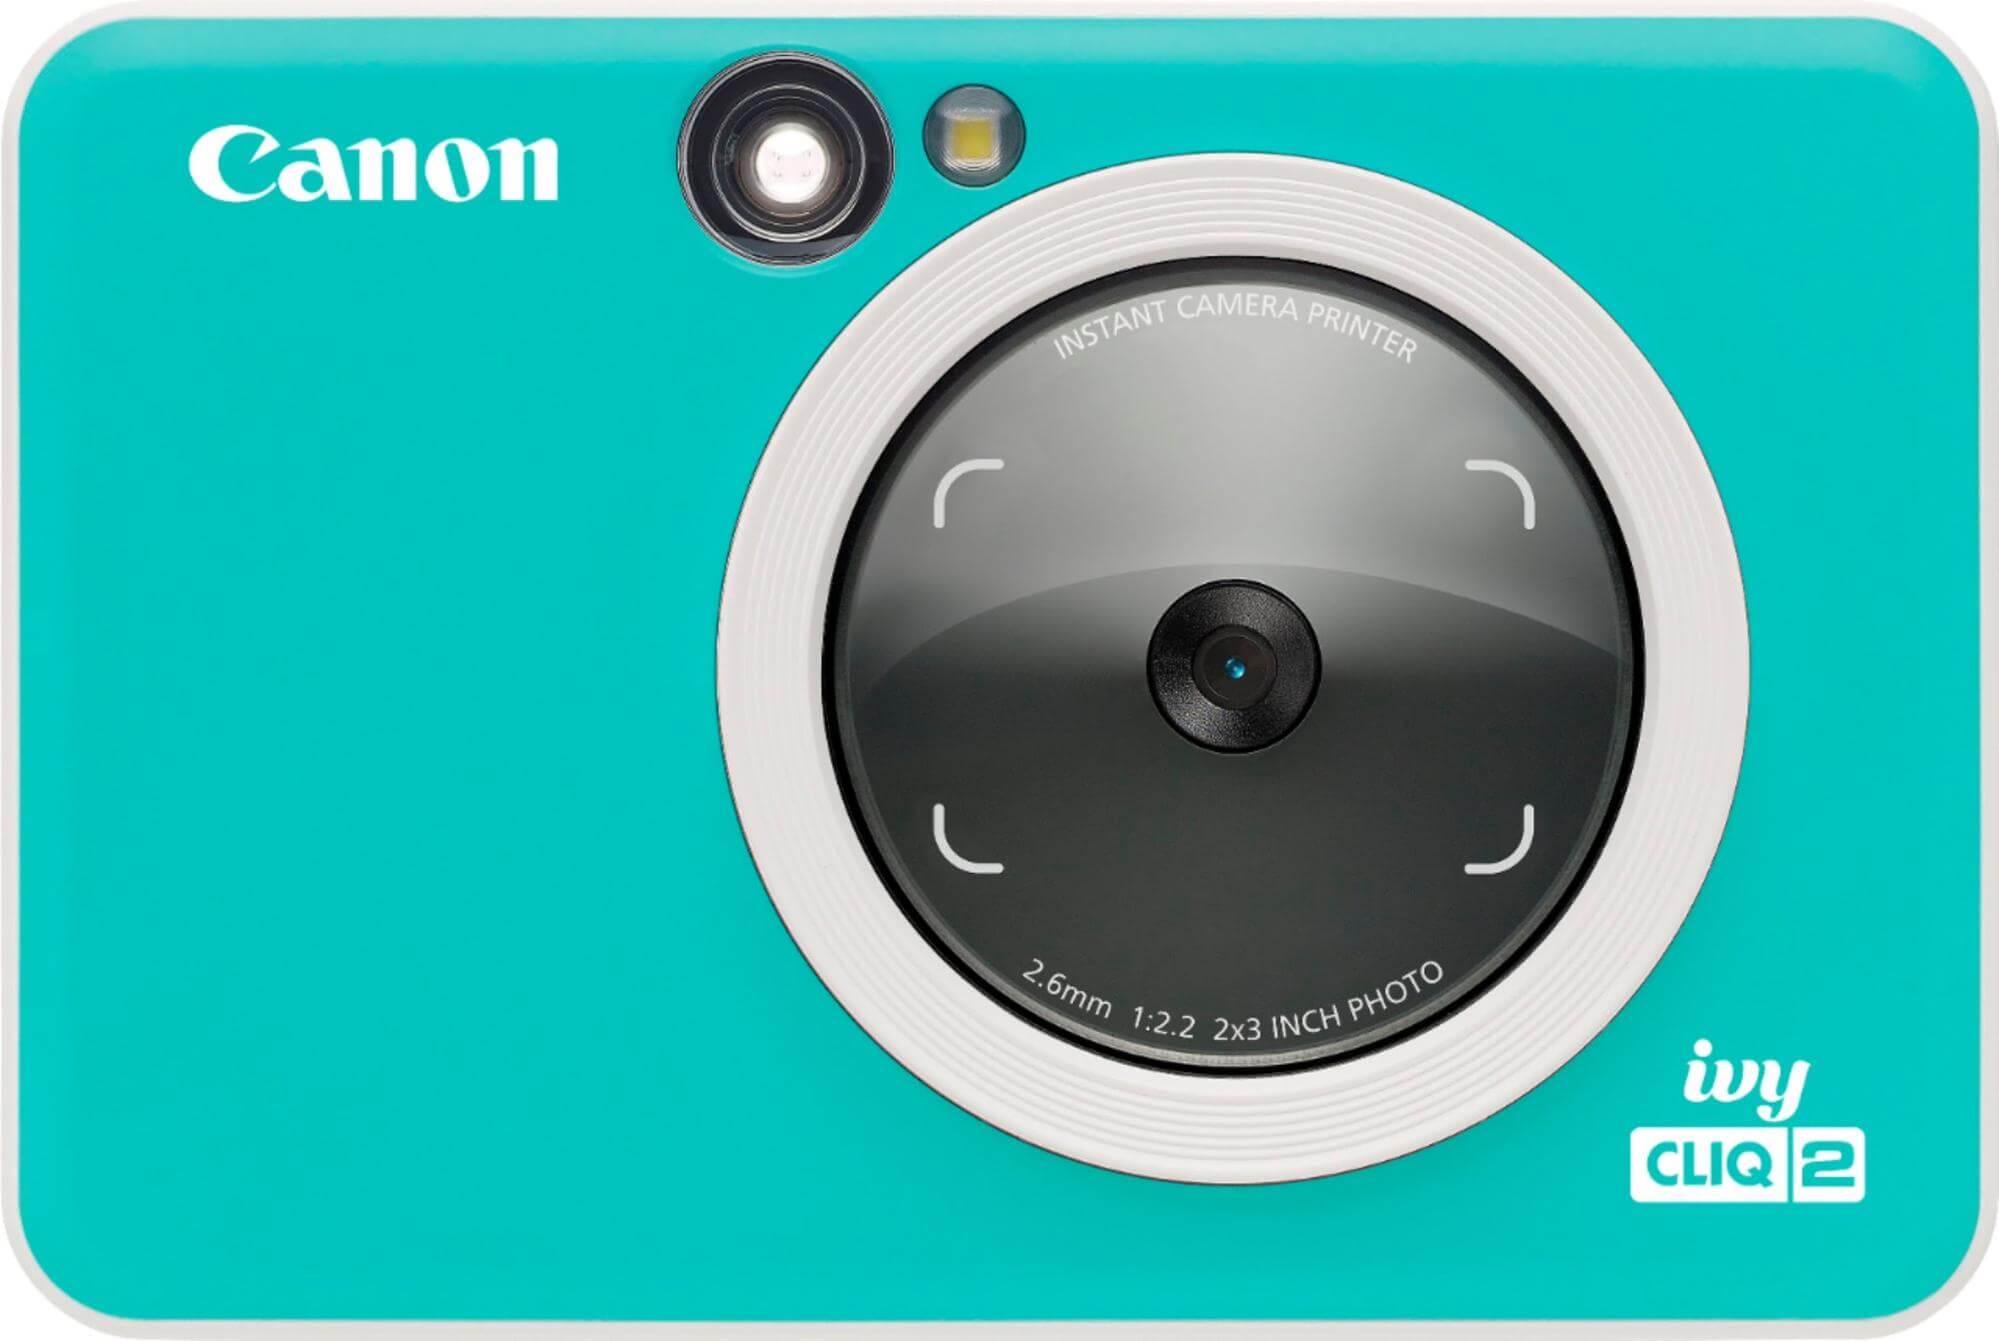 Best Instant Cameras - Canon Ivy CLIQ2 Instant Film Camera